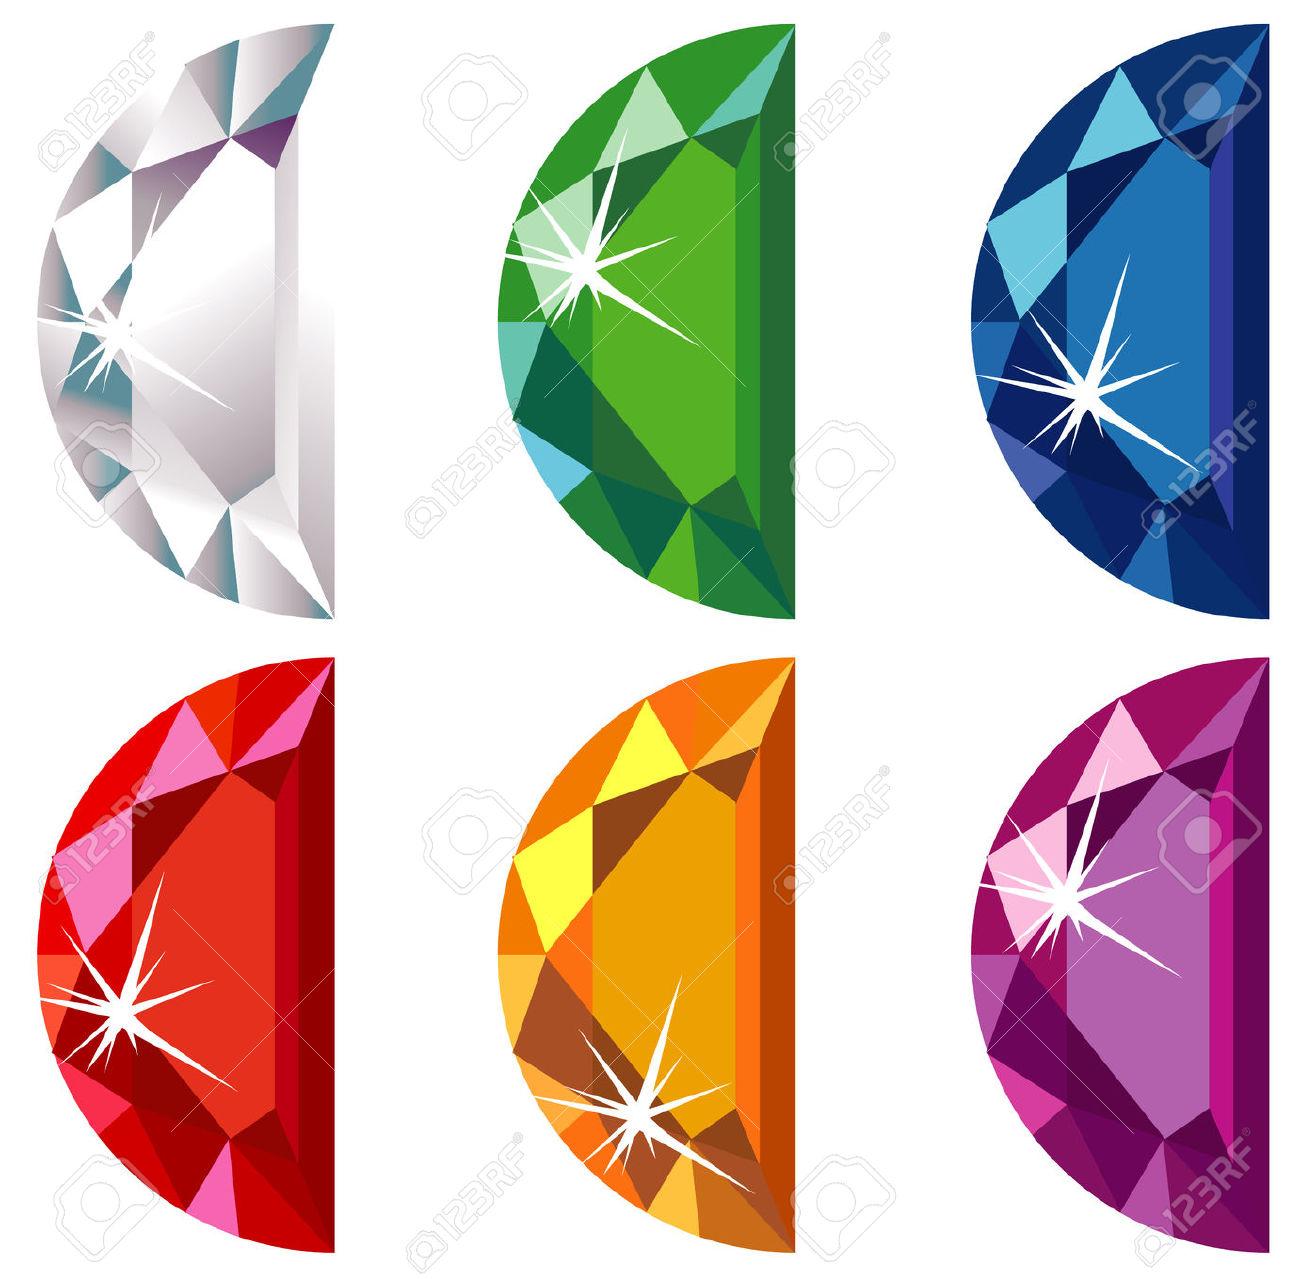 Half Moon Cut Precious Stones With Sparkle Royalty Free Cliparts.